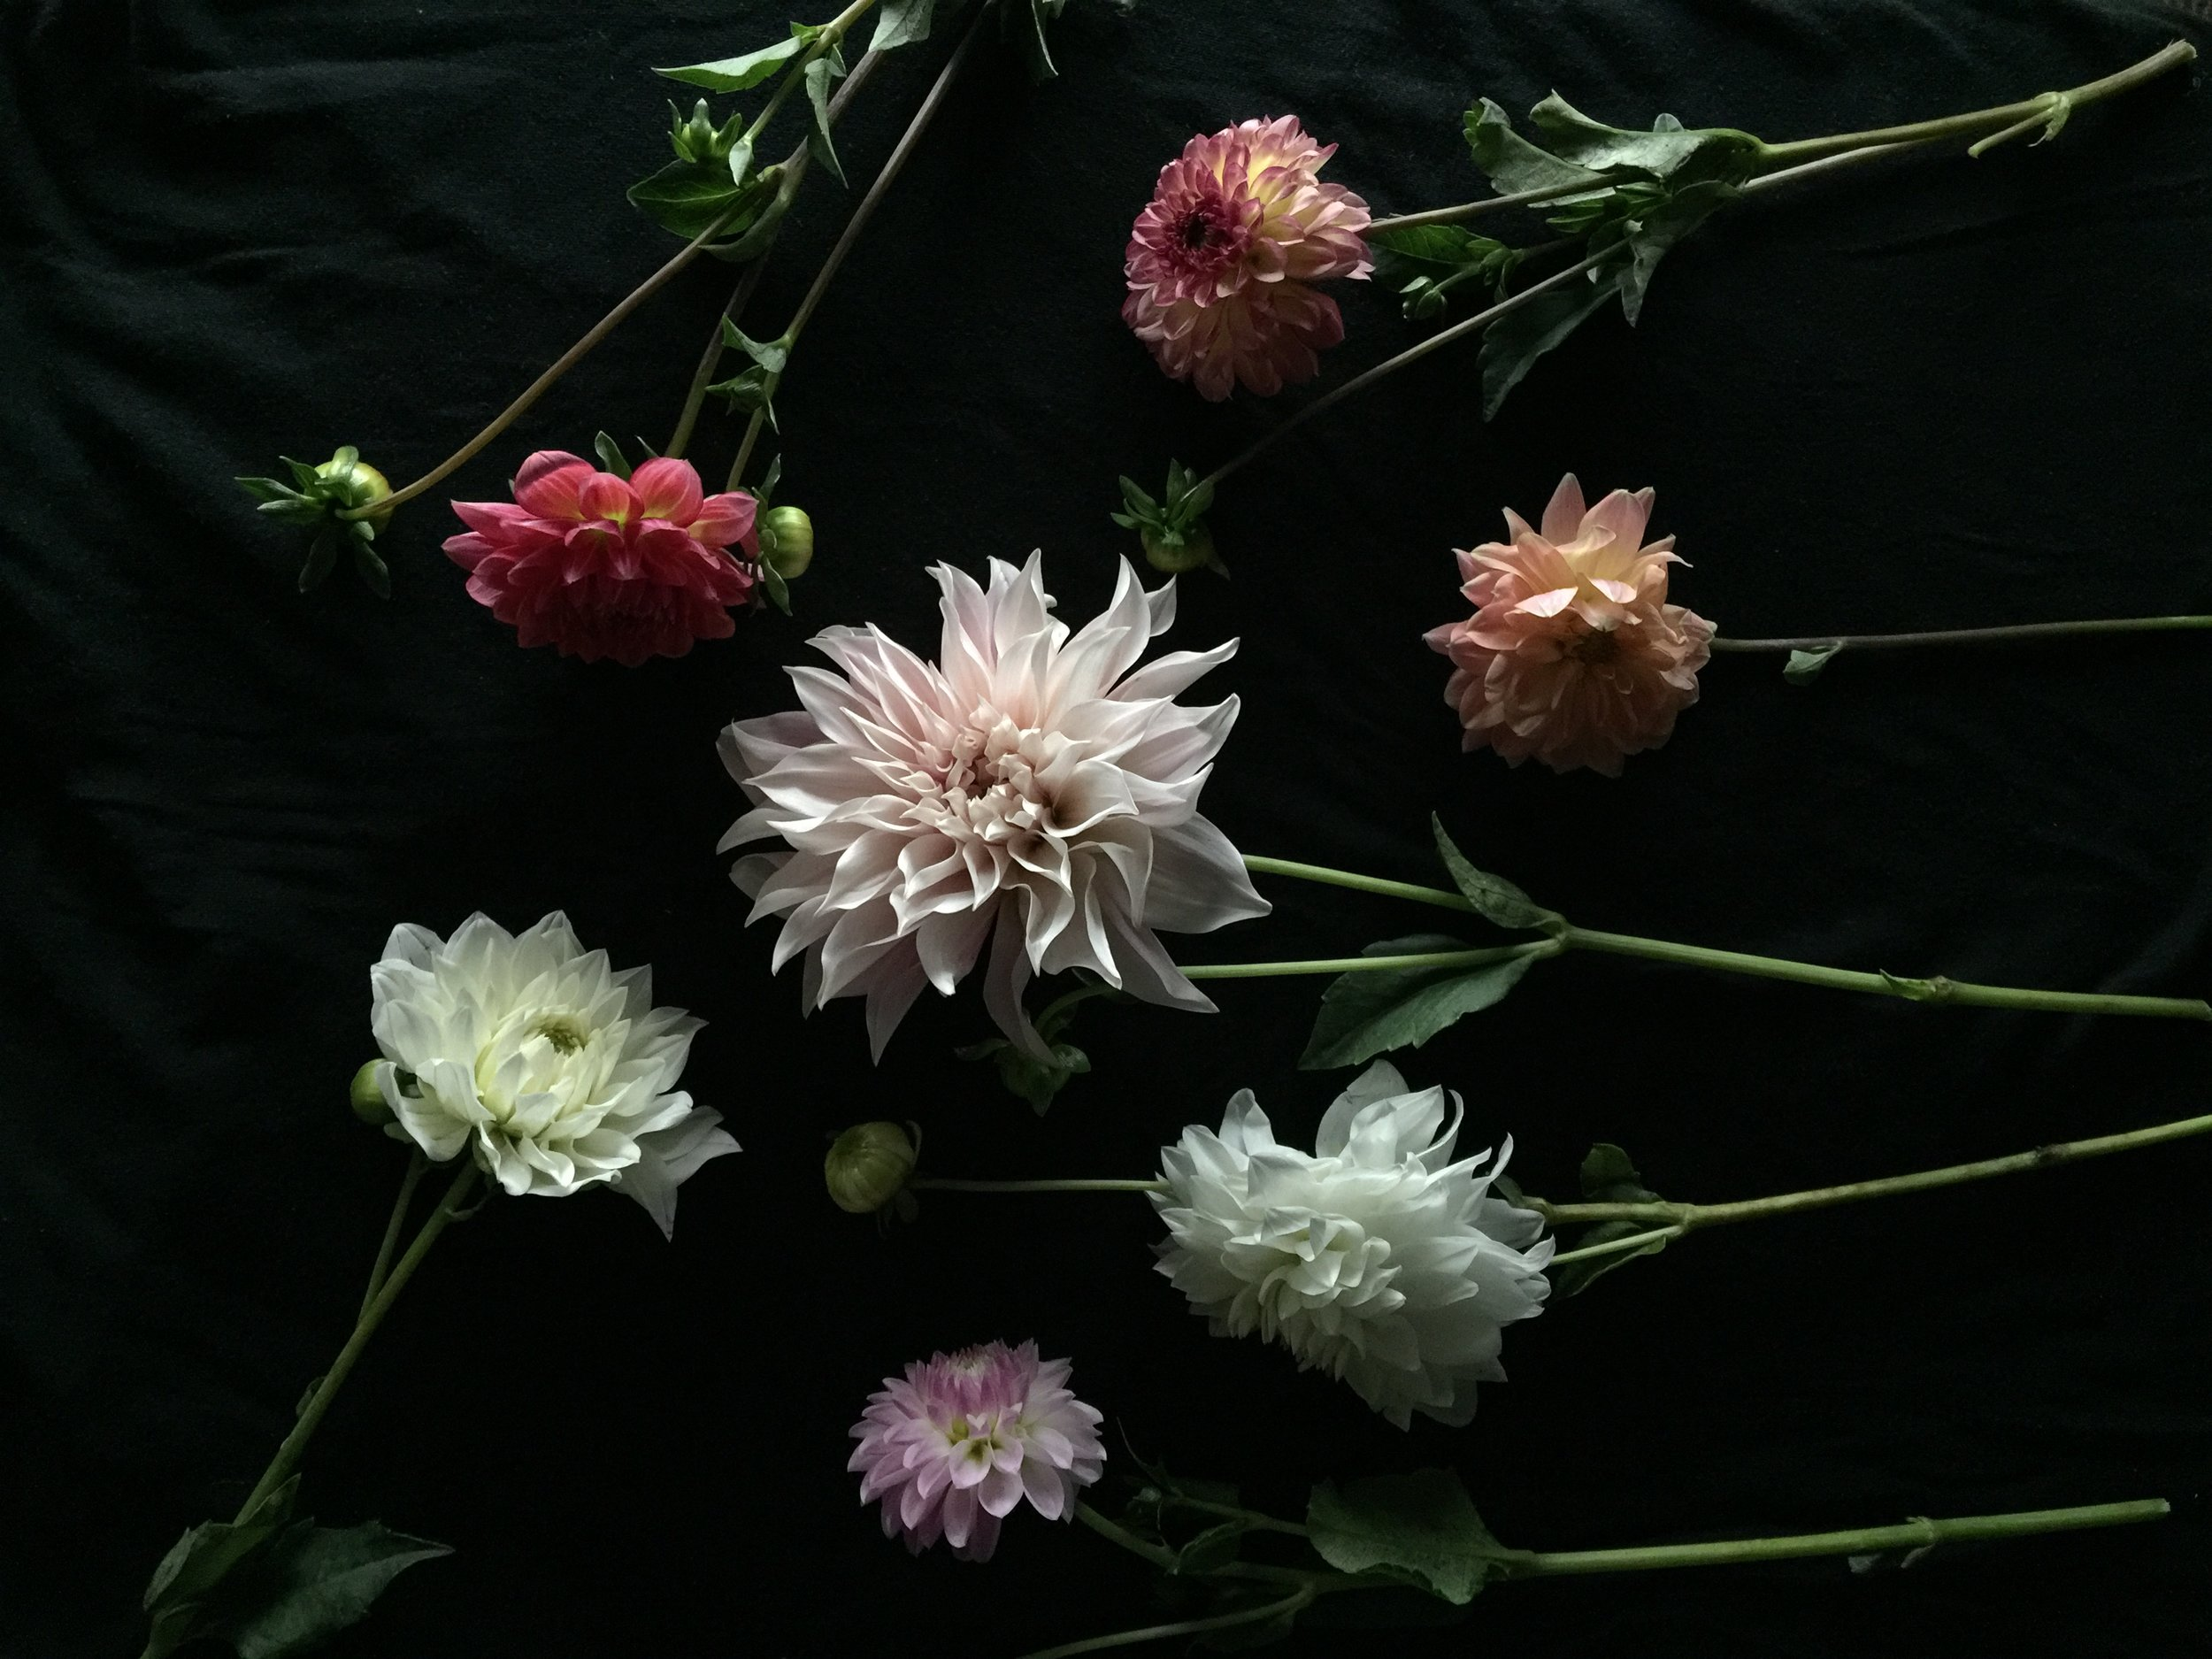 Dahlias, the flower of the ombre season.